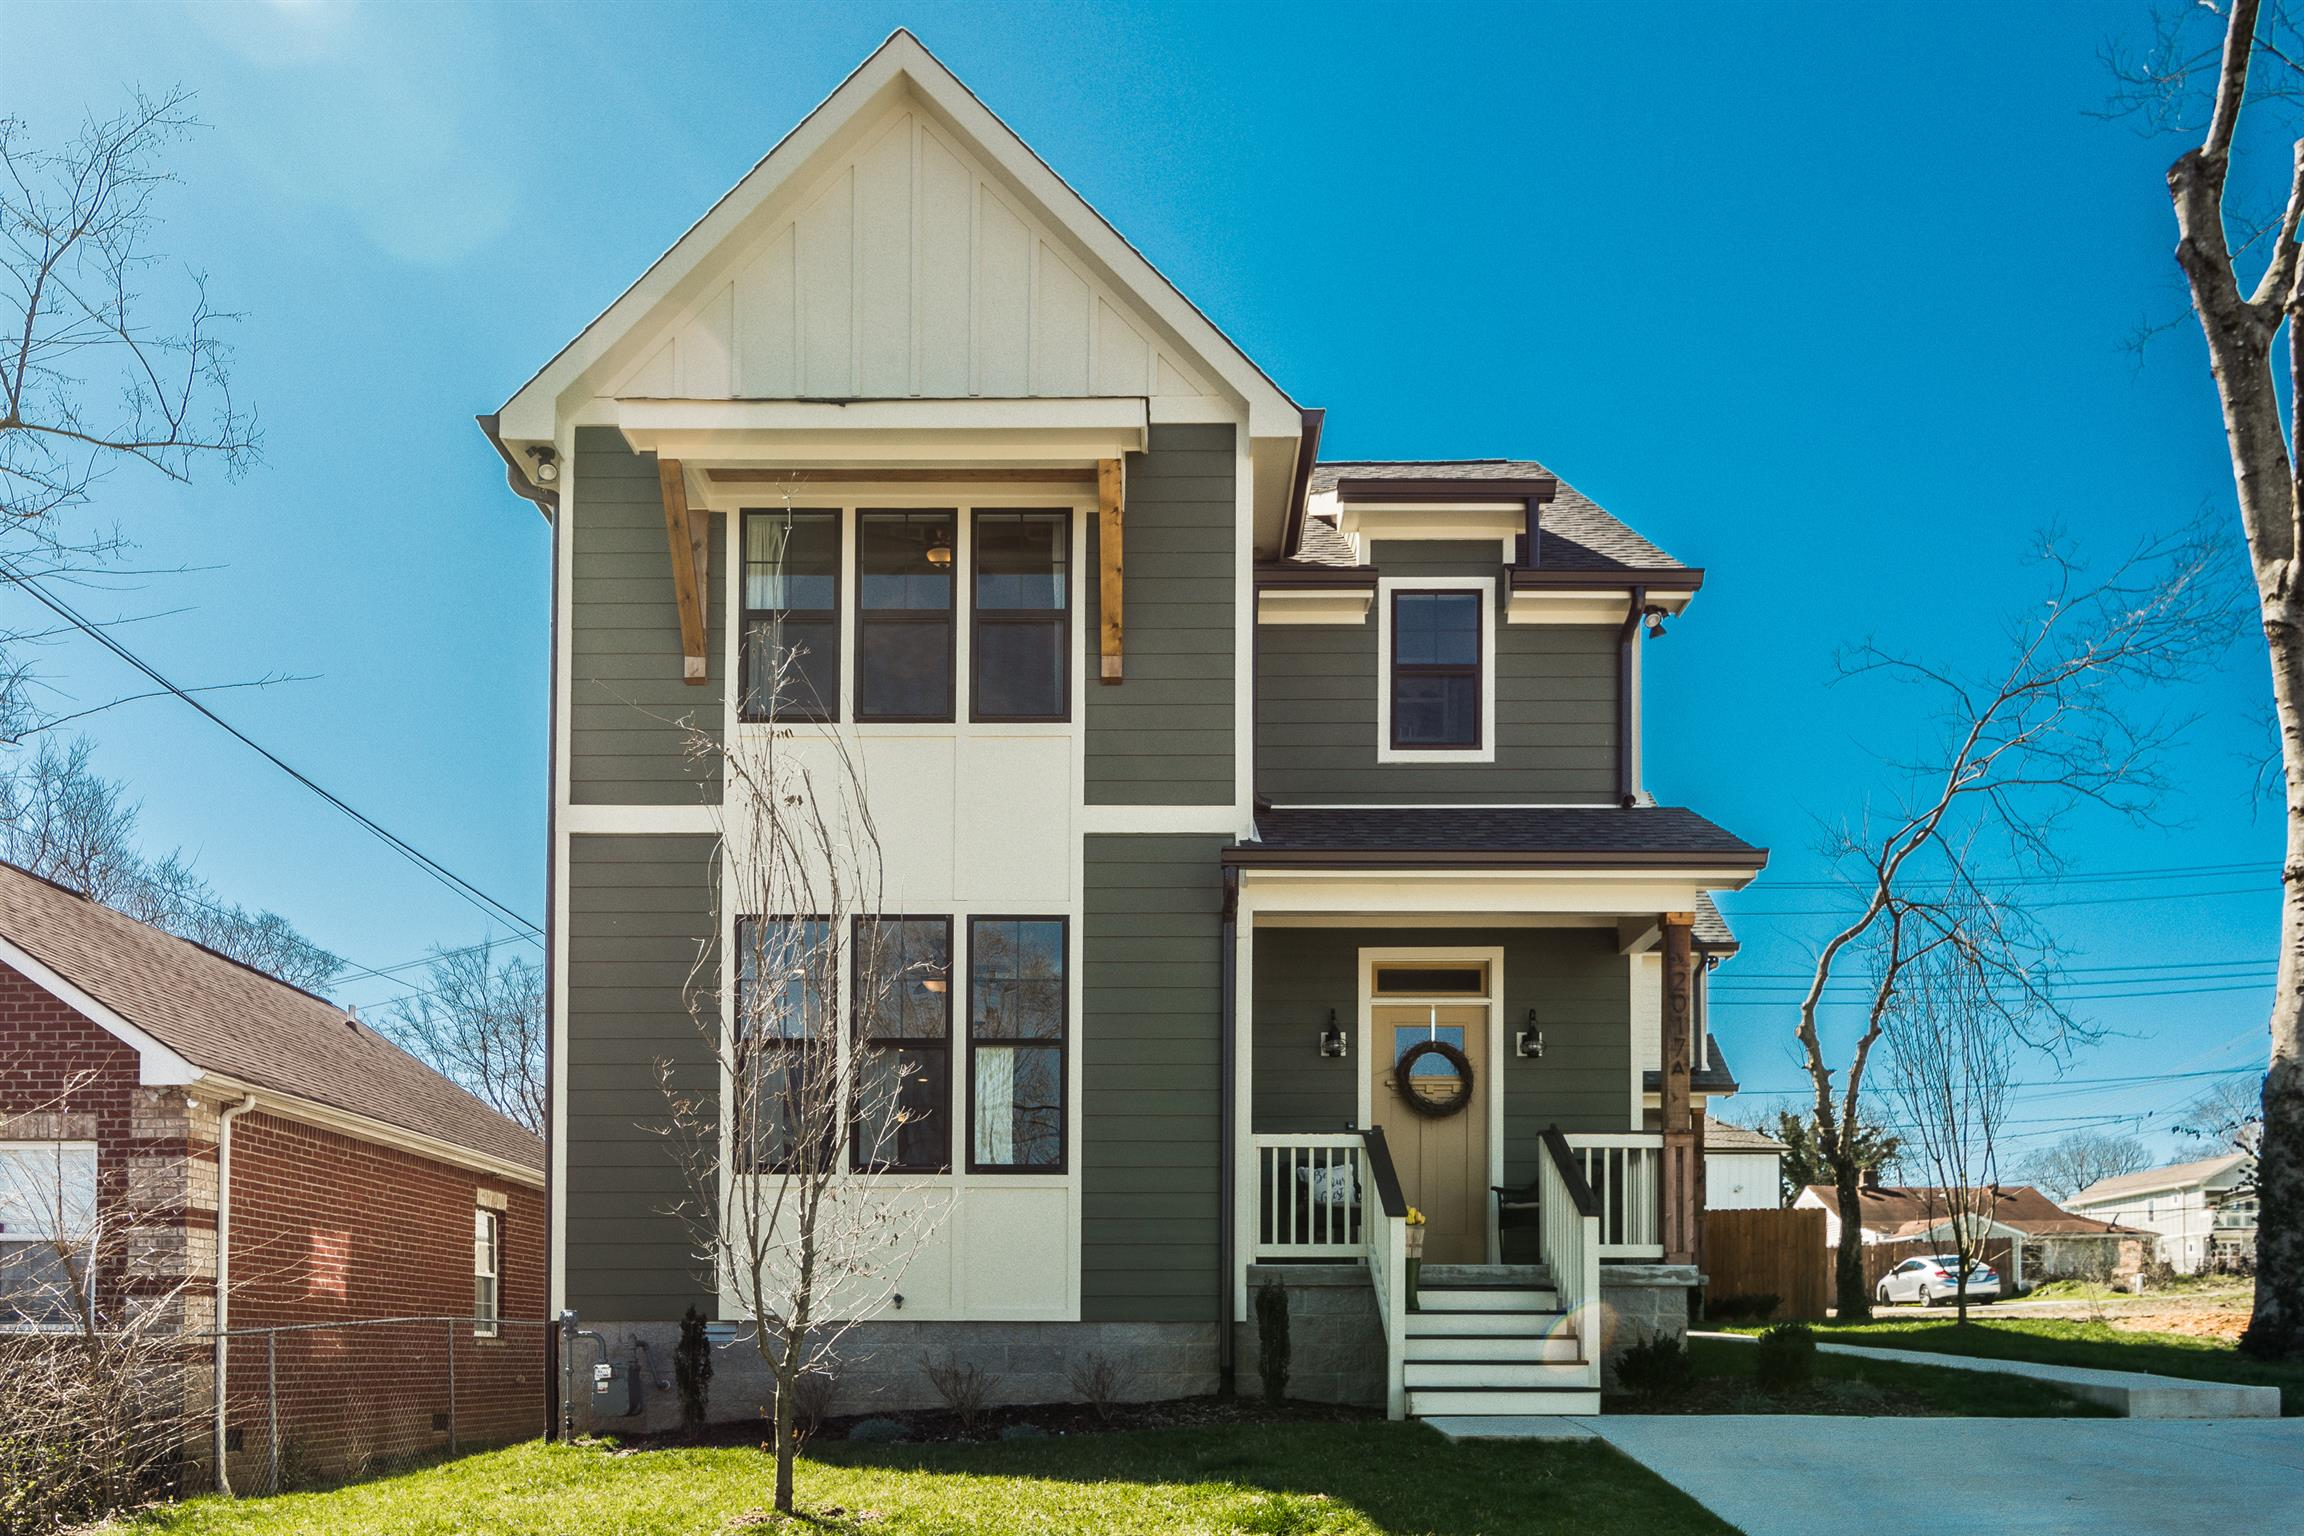 2017A 12Th Ave N, Nashville, TN 37208 - Nashville, TN real estate listing